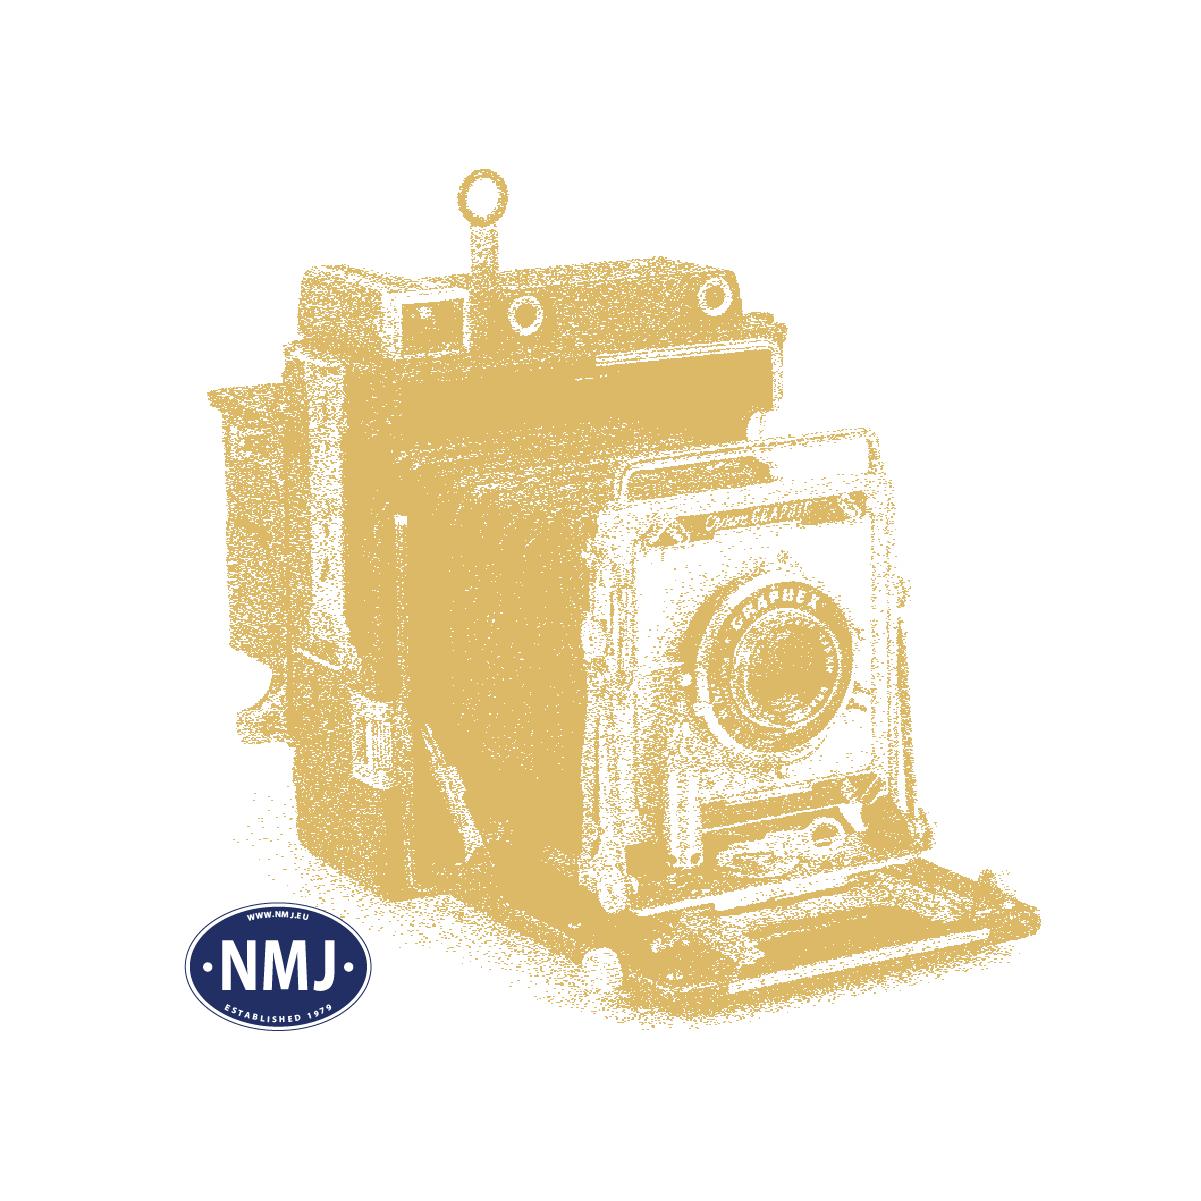 NMJT84.101 - NMJ Topline NSB BM69A.01, DCC w/ Sound